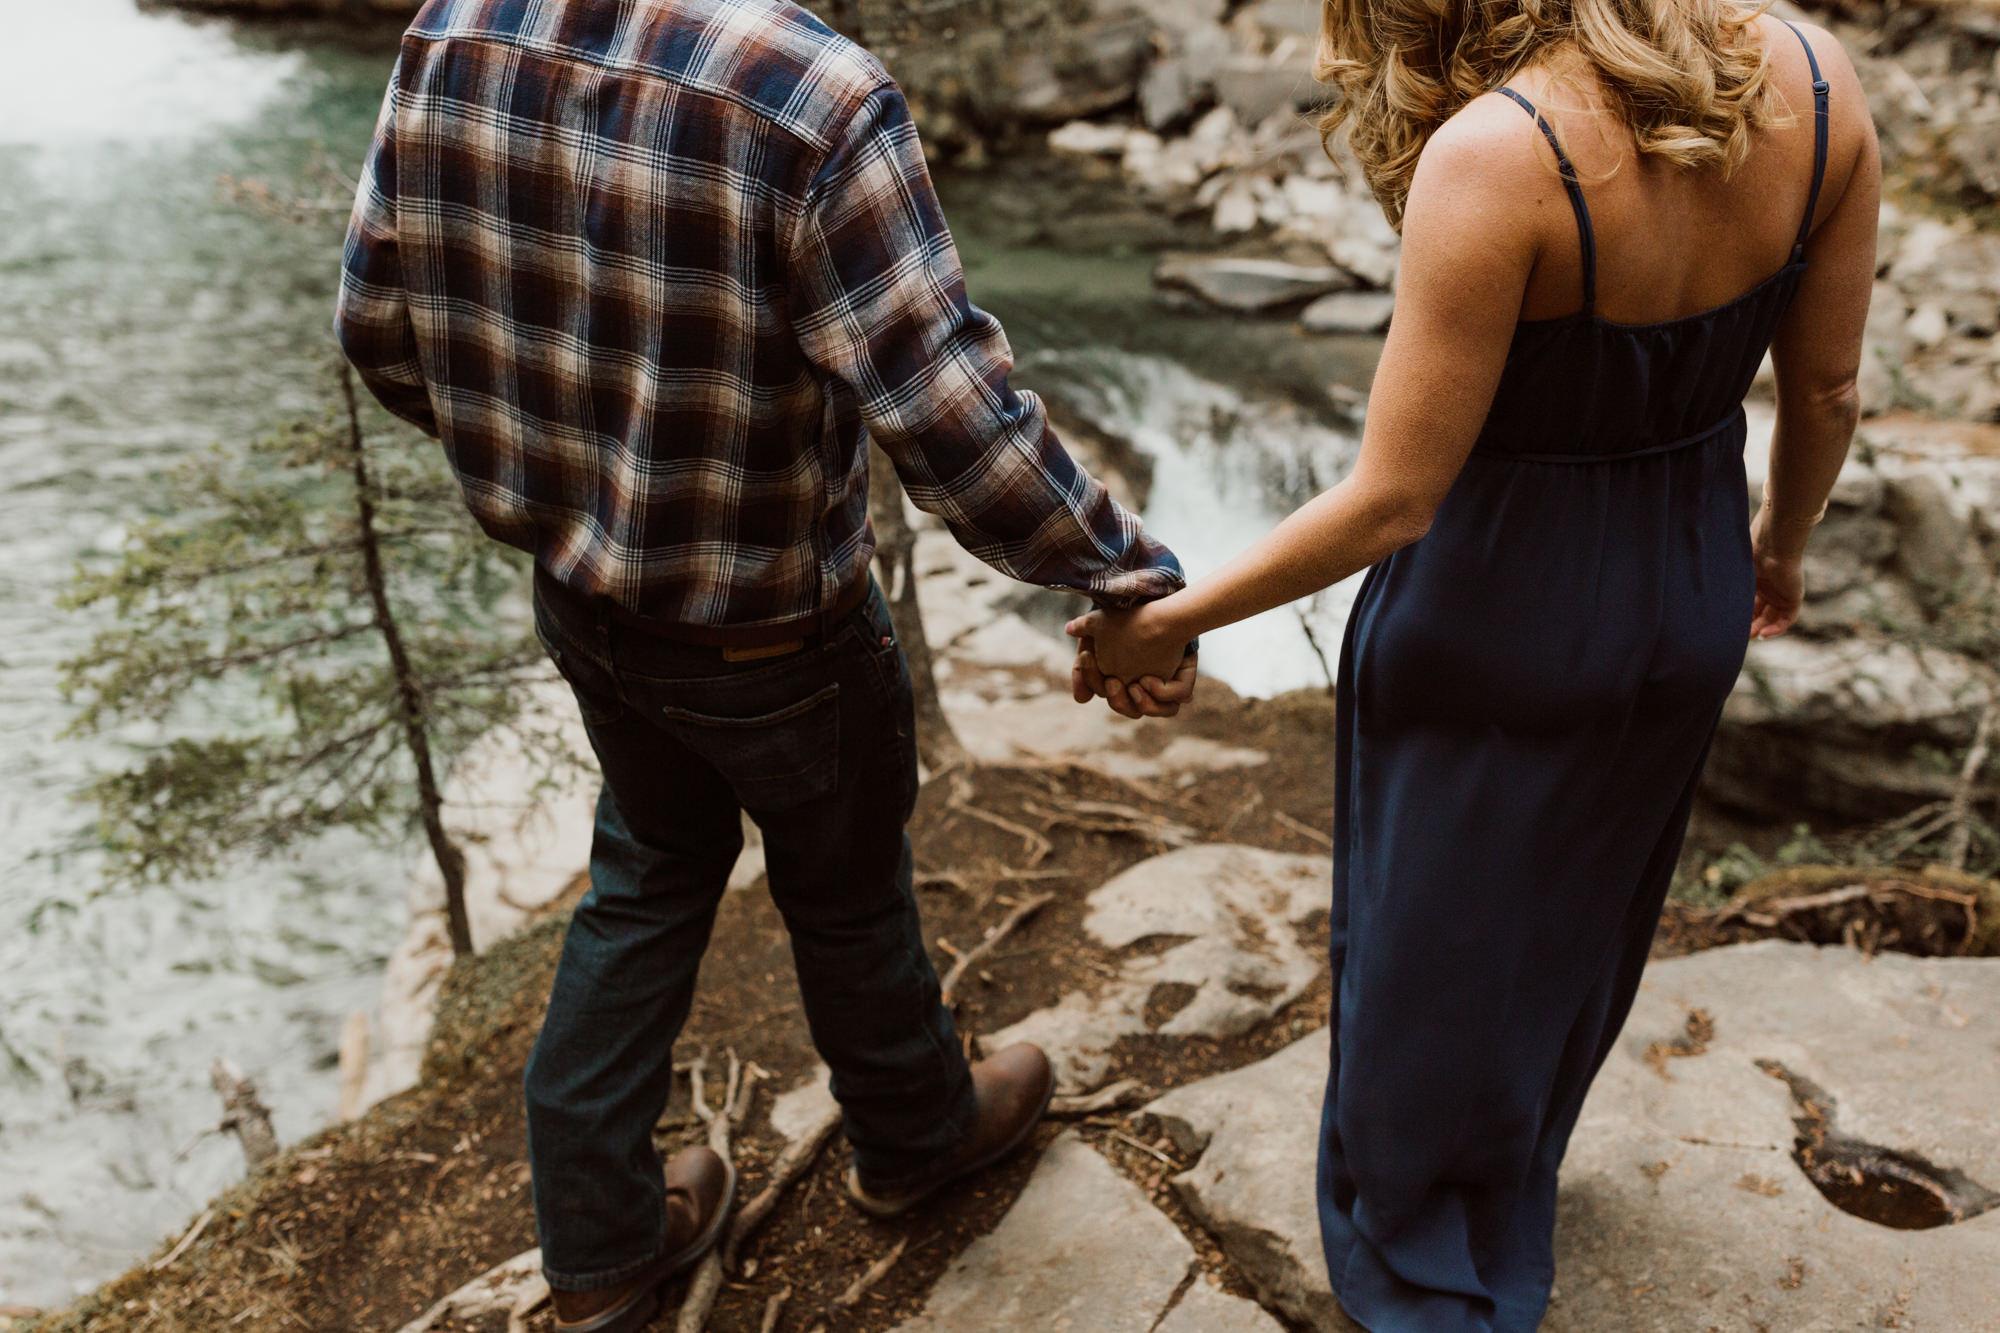 banff-engagements-destination-wedding-photographer-21.jpg